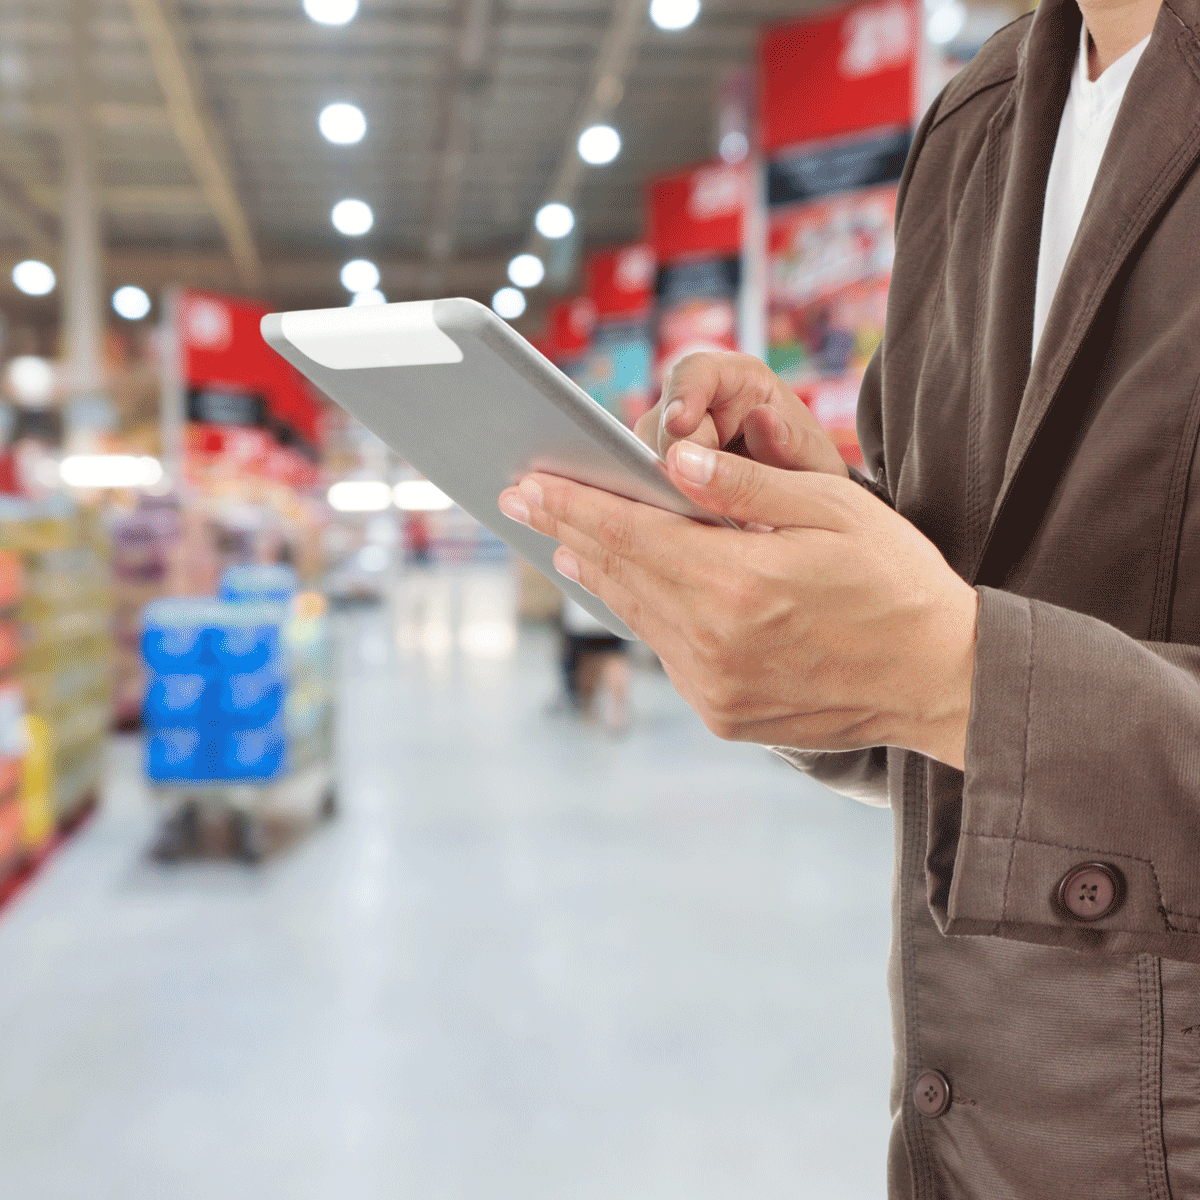 tablet-retail-shutterstock_475360171-1200x1200